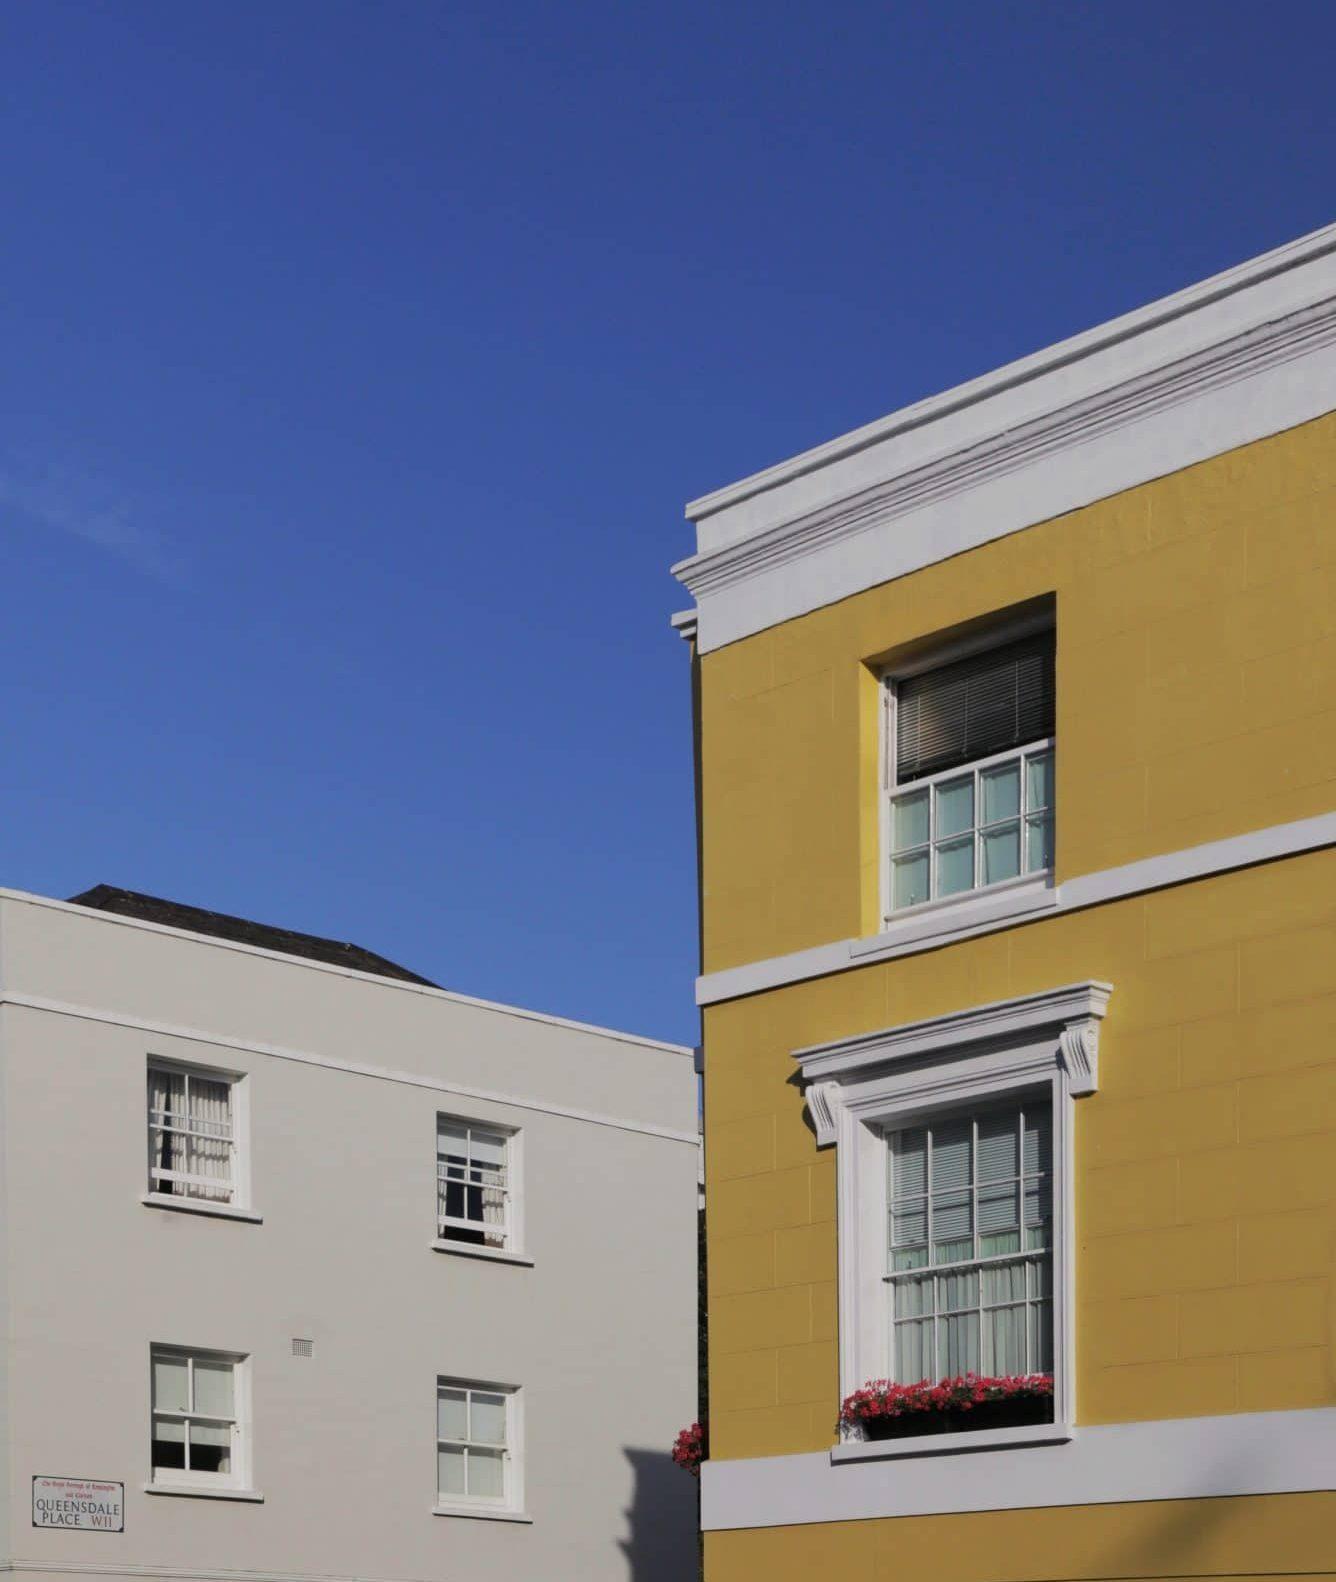 Property Guardianship and Business Rates